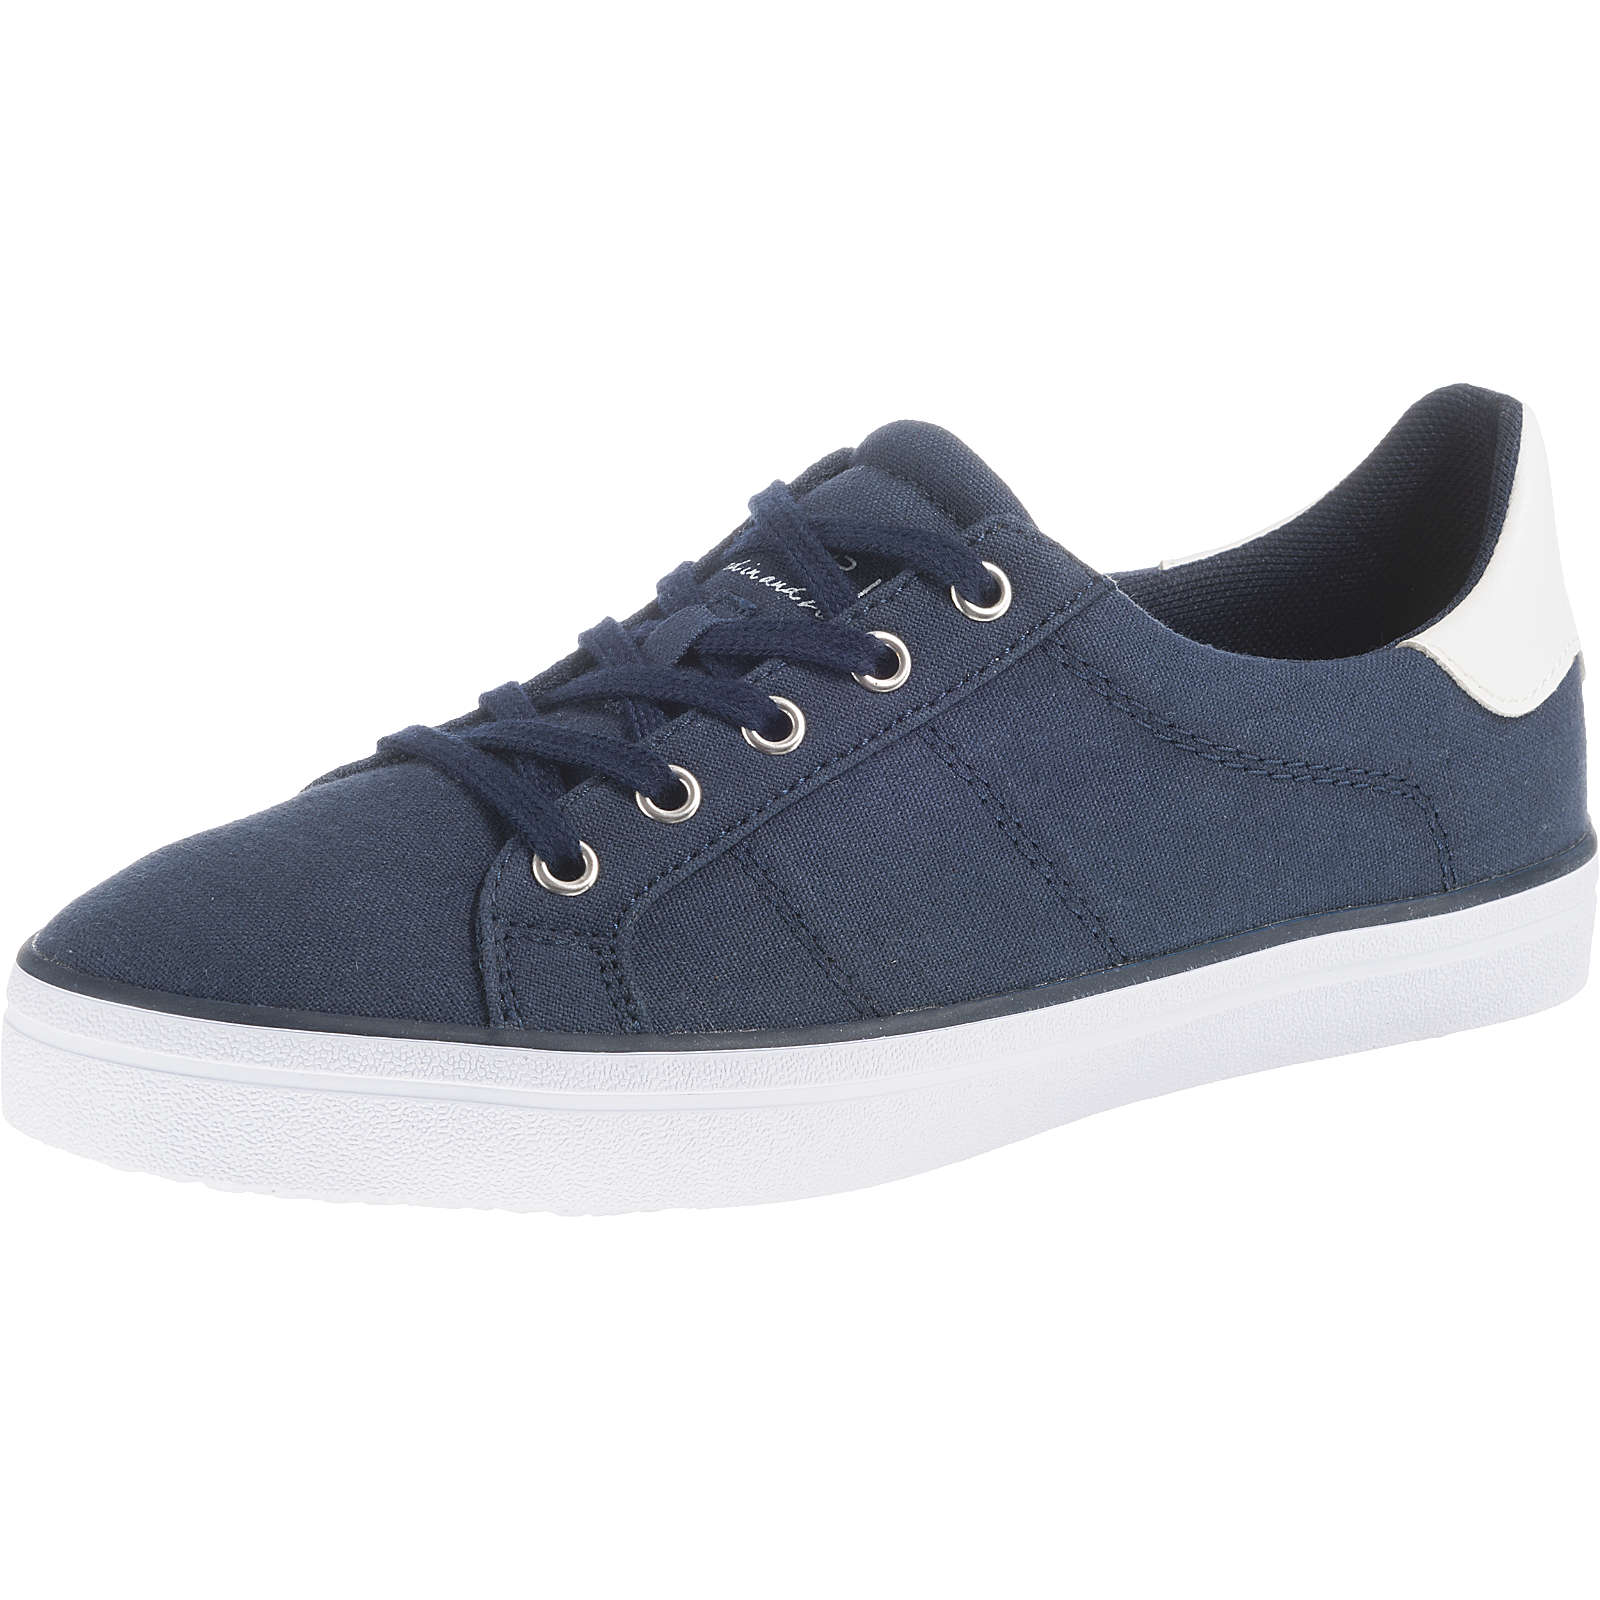 ESPRIT Mindy LU Sneakers Low dunkelblau Damen Gr. 36